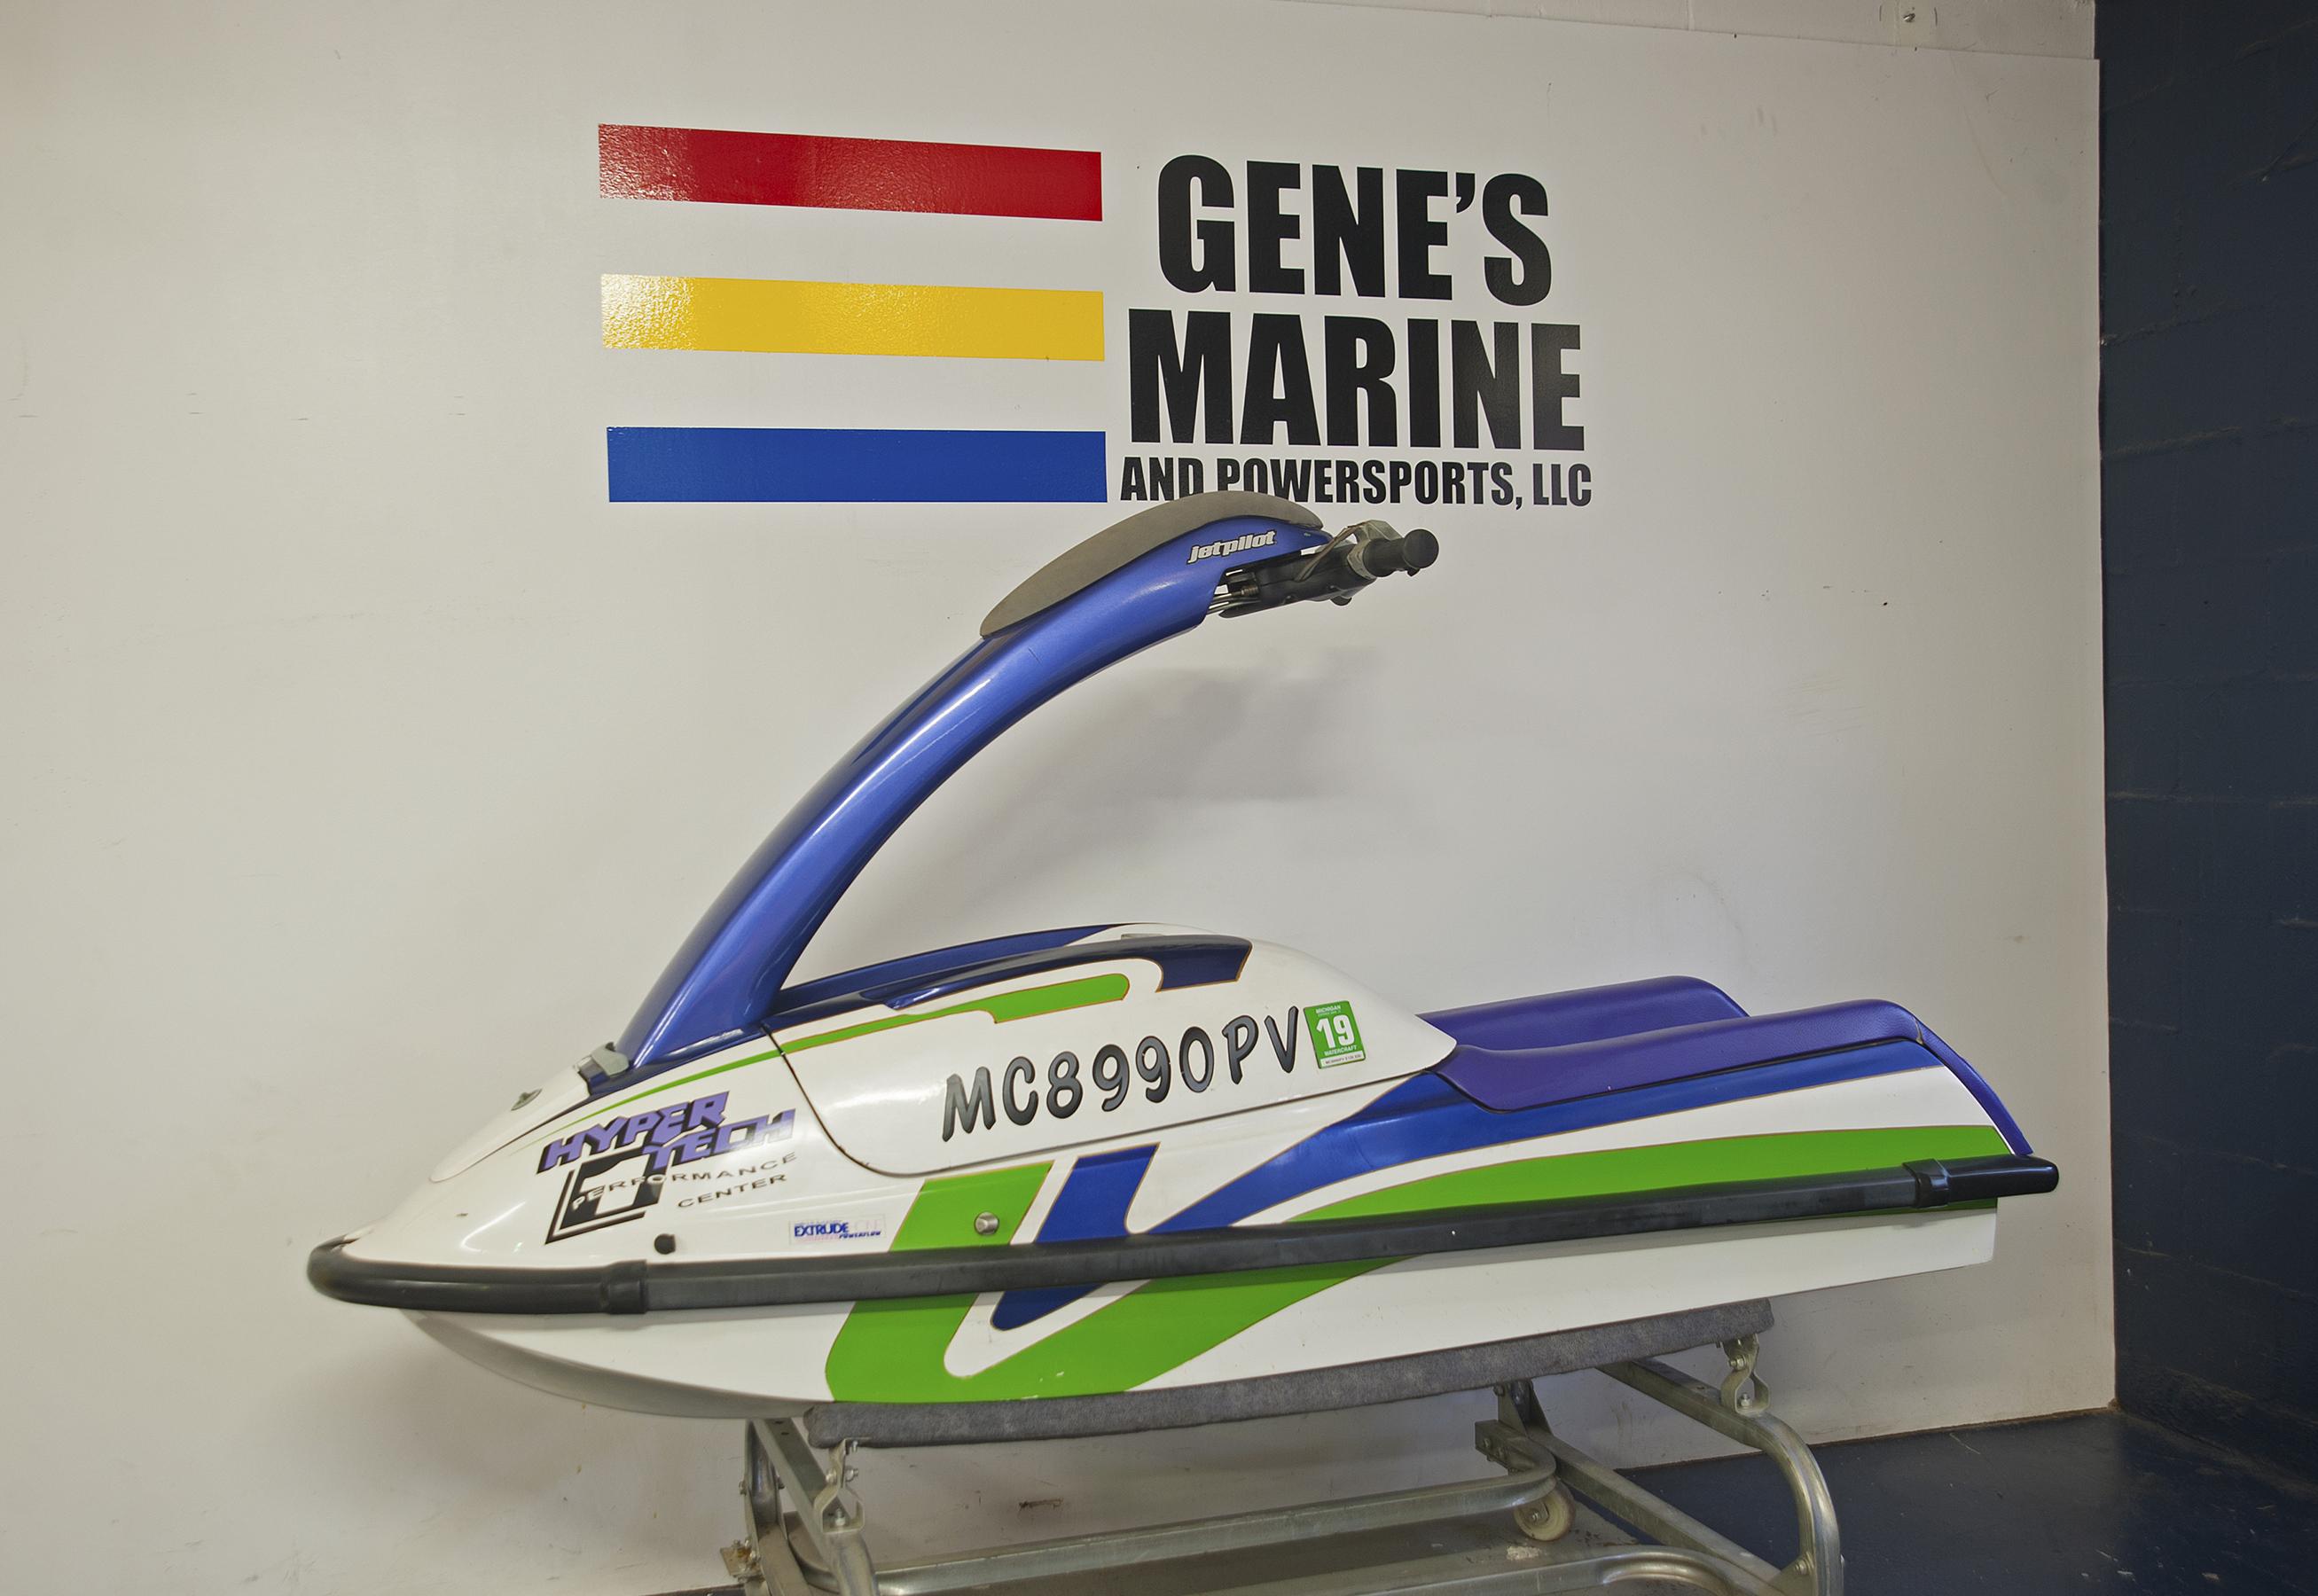 Used Jet Skis | Richland, MI: Genes Marine and Power Sports, LLC